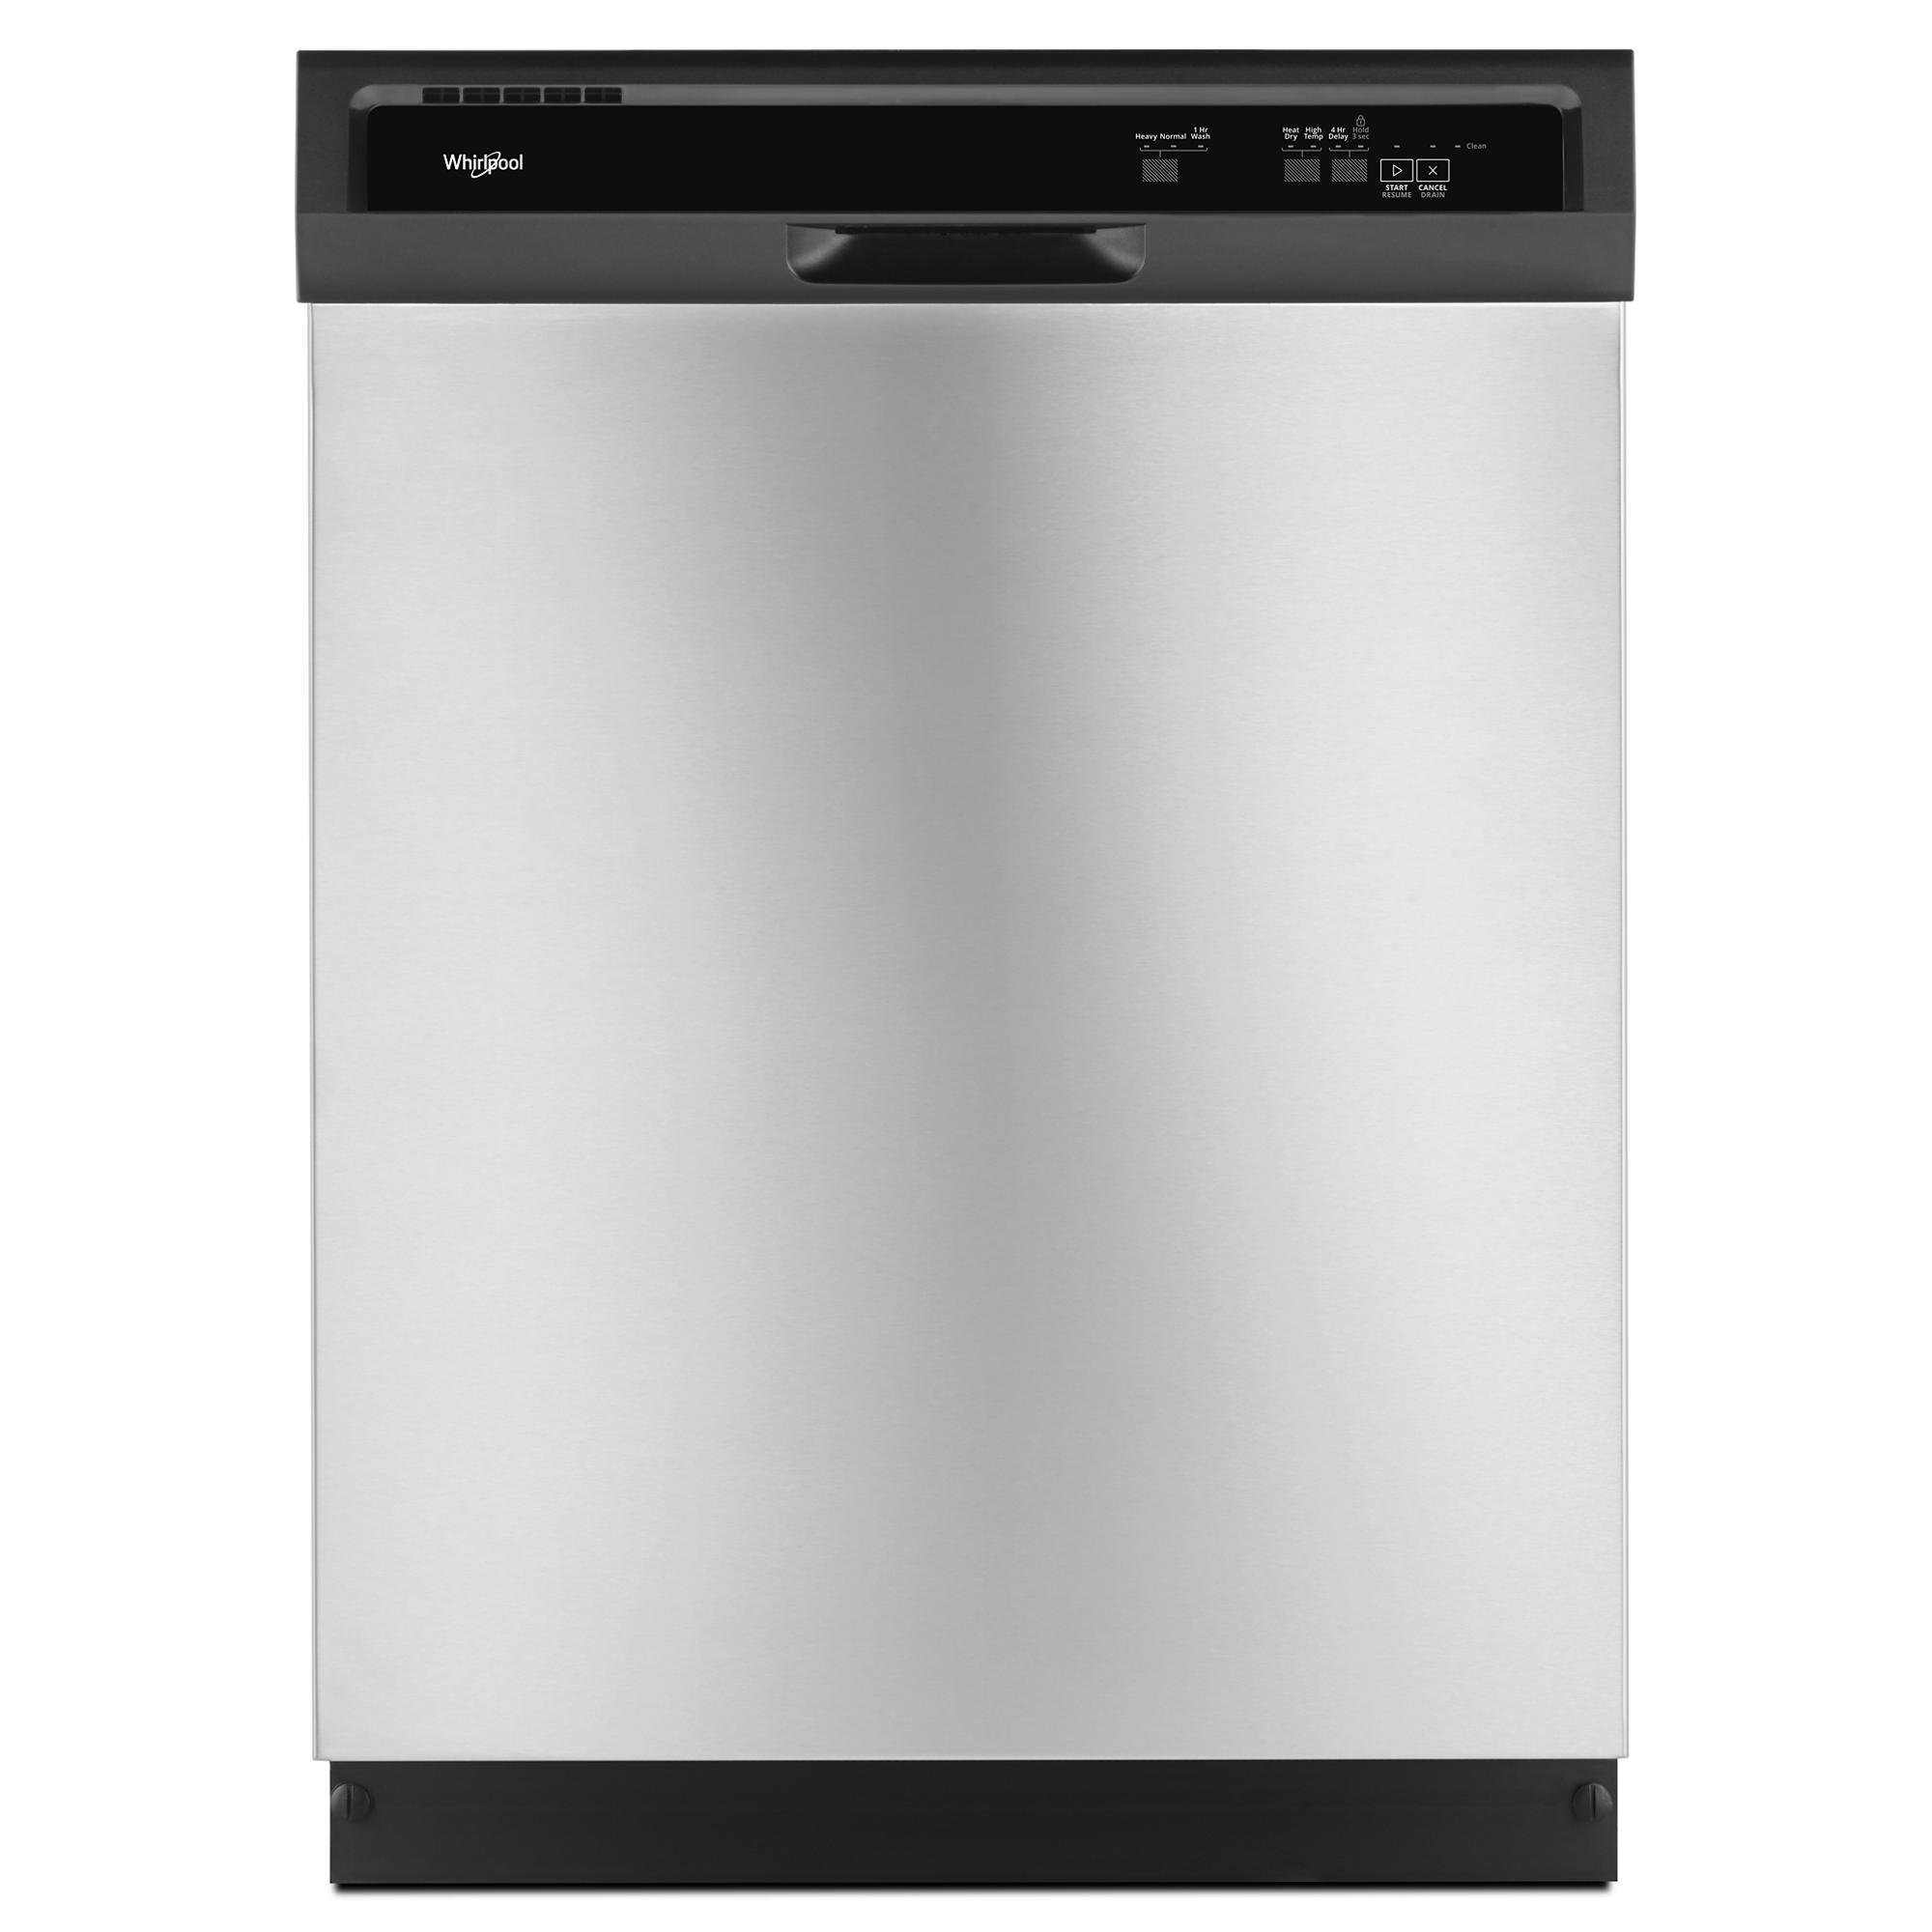 Wdf330pah Whirlpool Wdf330pah Built In Dishwashers